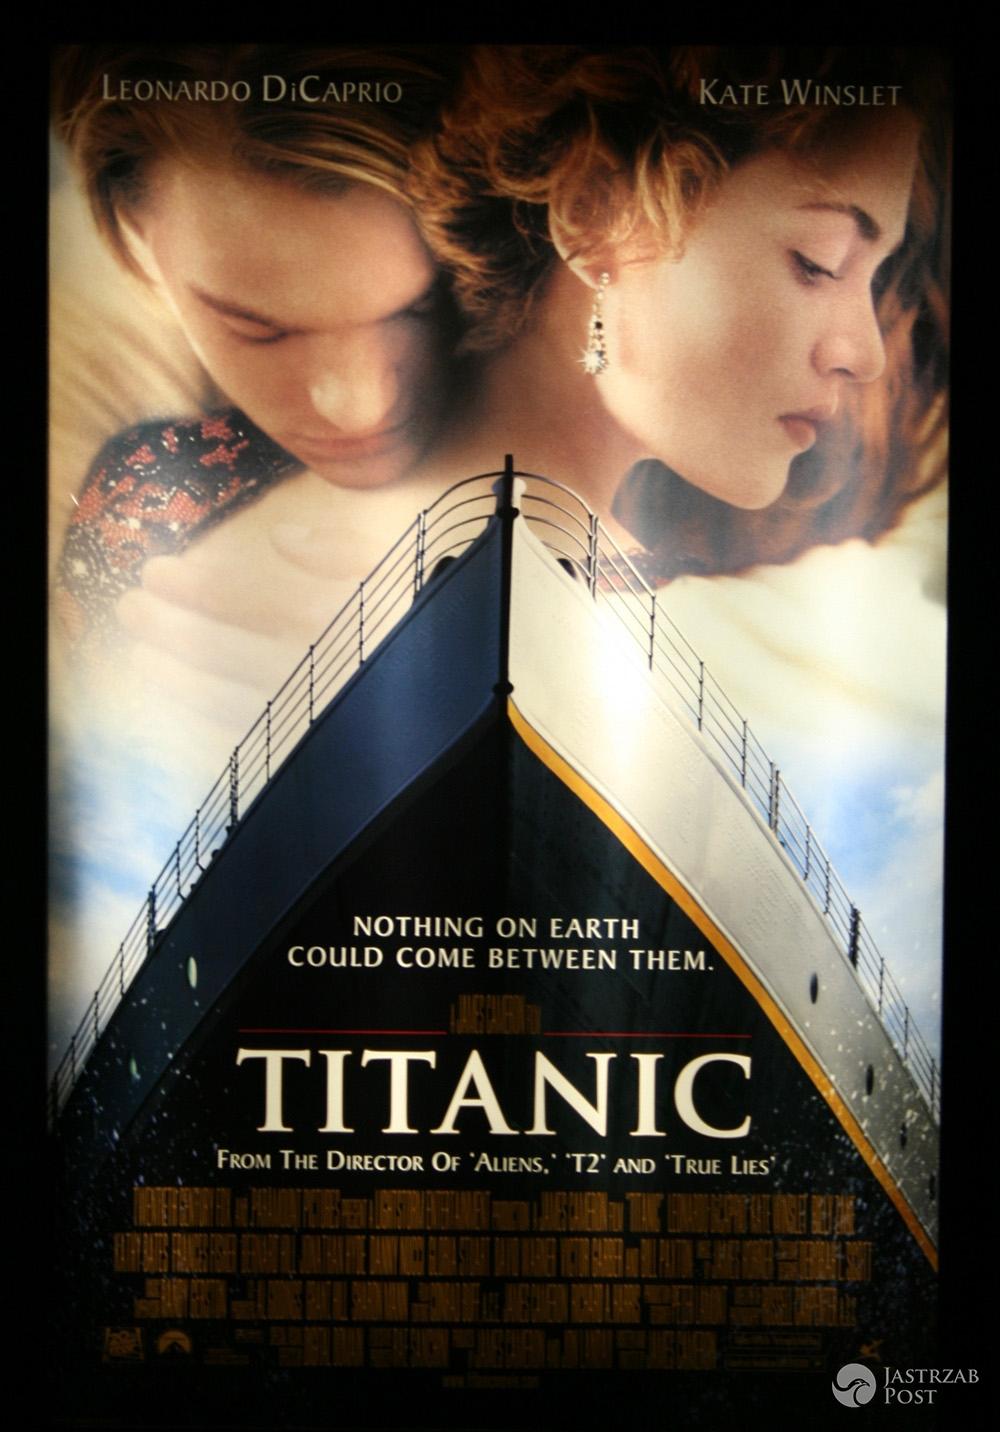 Titanic - plakat promujący film